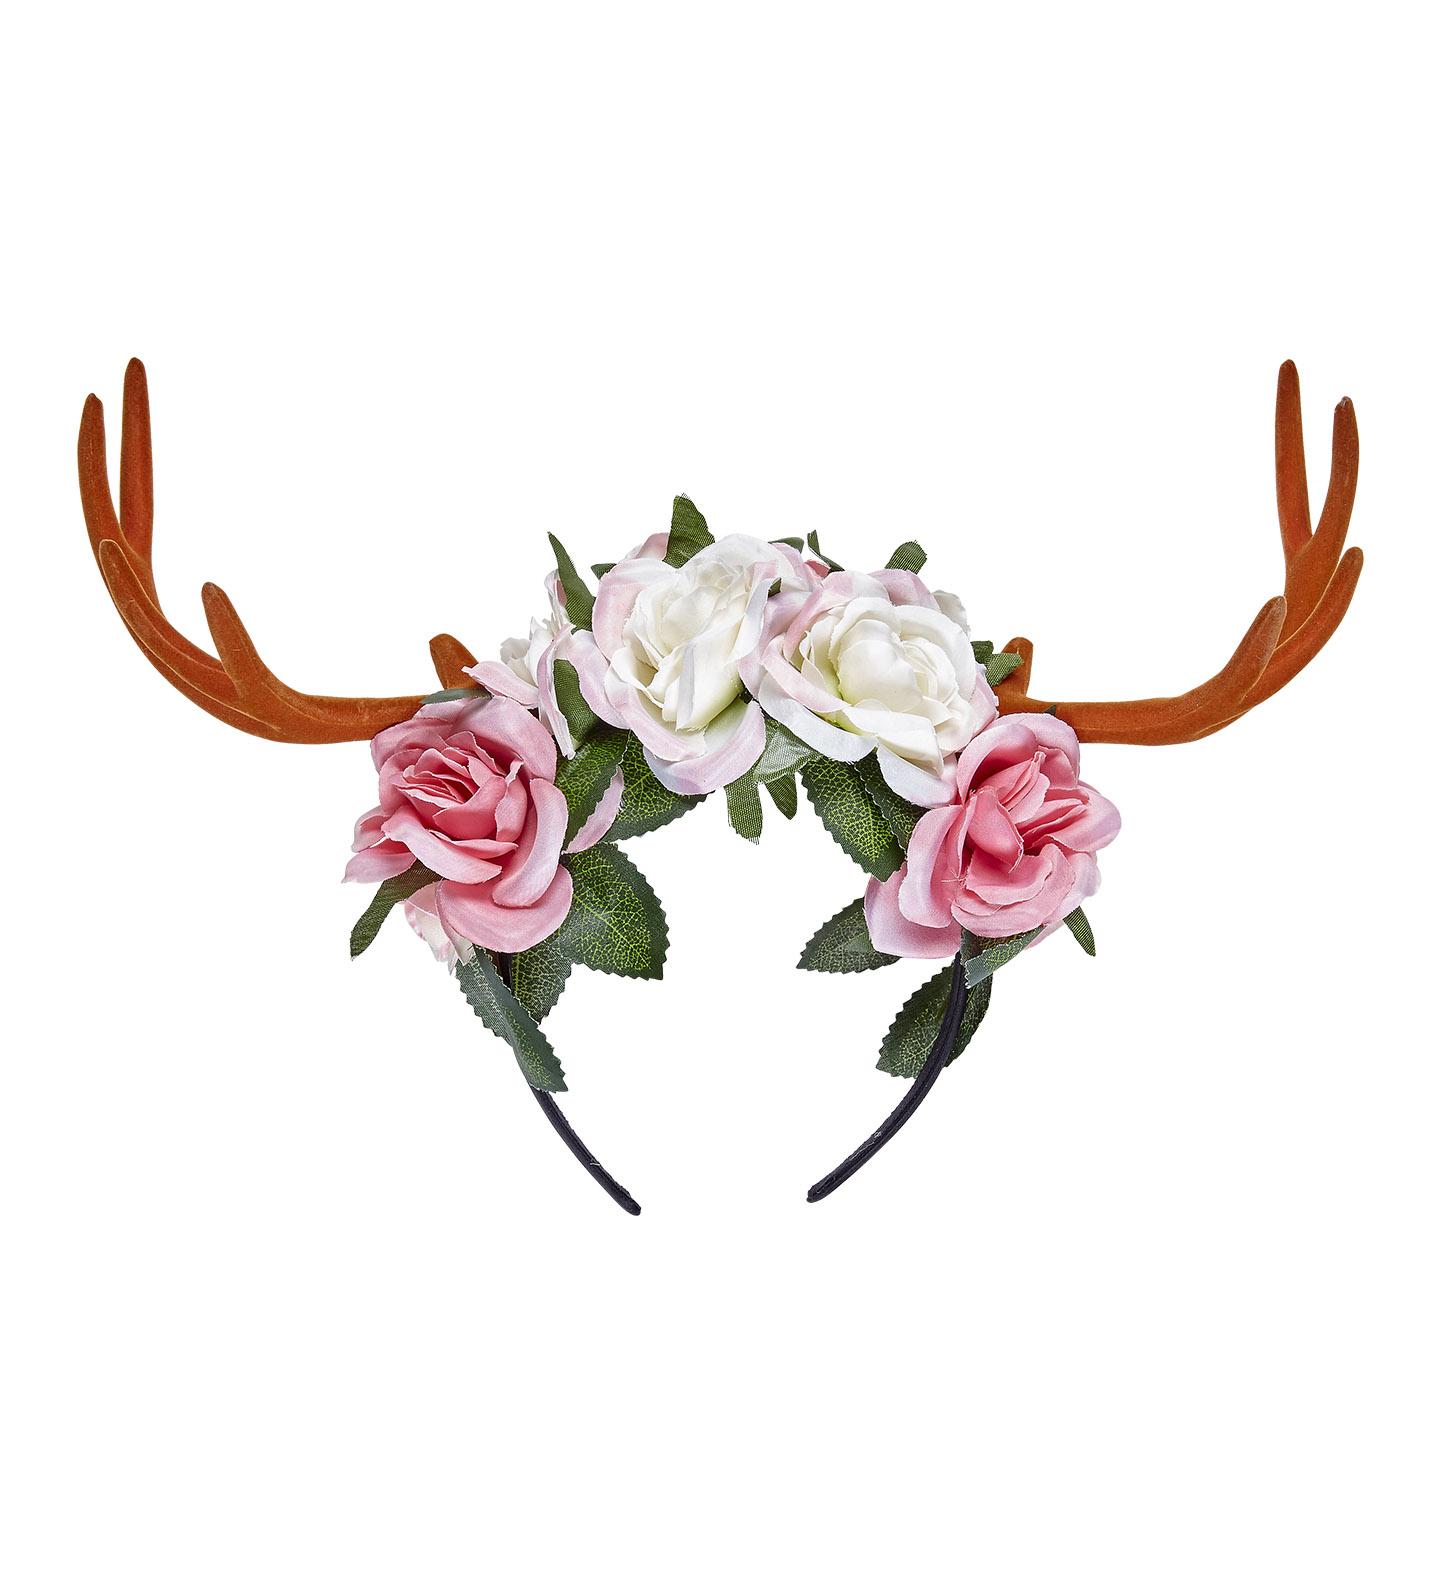 haarreif rentier geweih elch elchgeweih reh elfe waldfee. Black Bedroom Furniture Sets. Home Design Ideas